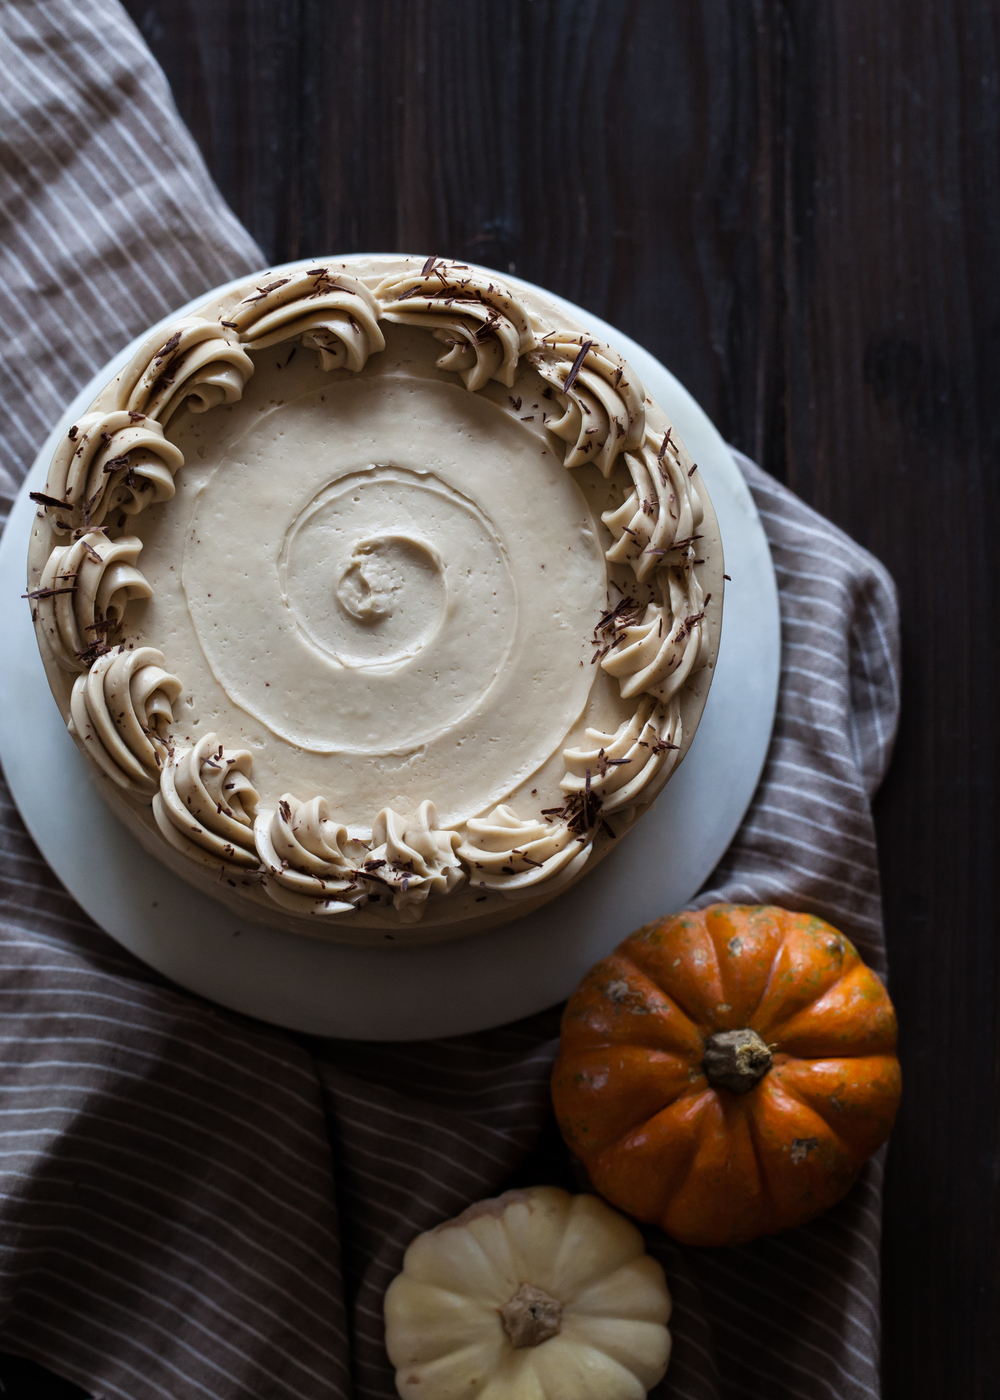 PumpkinStout_Checkerboard_Cake06.jpg